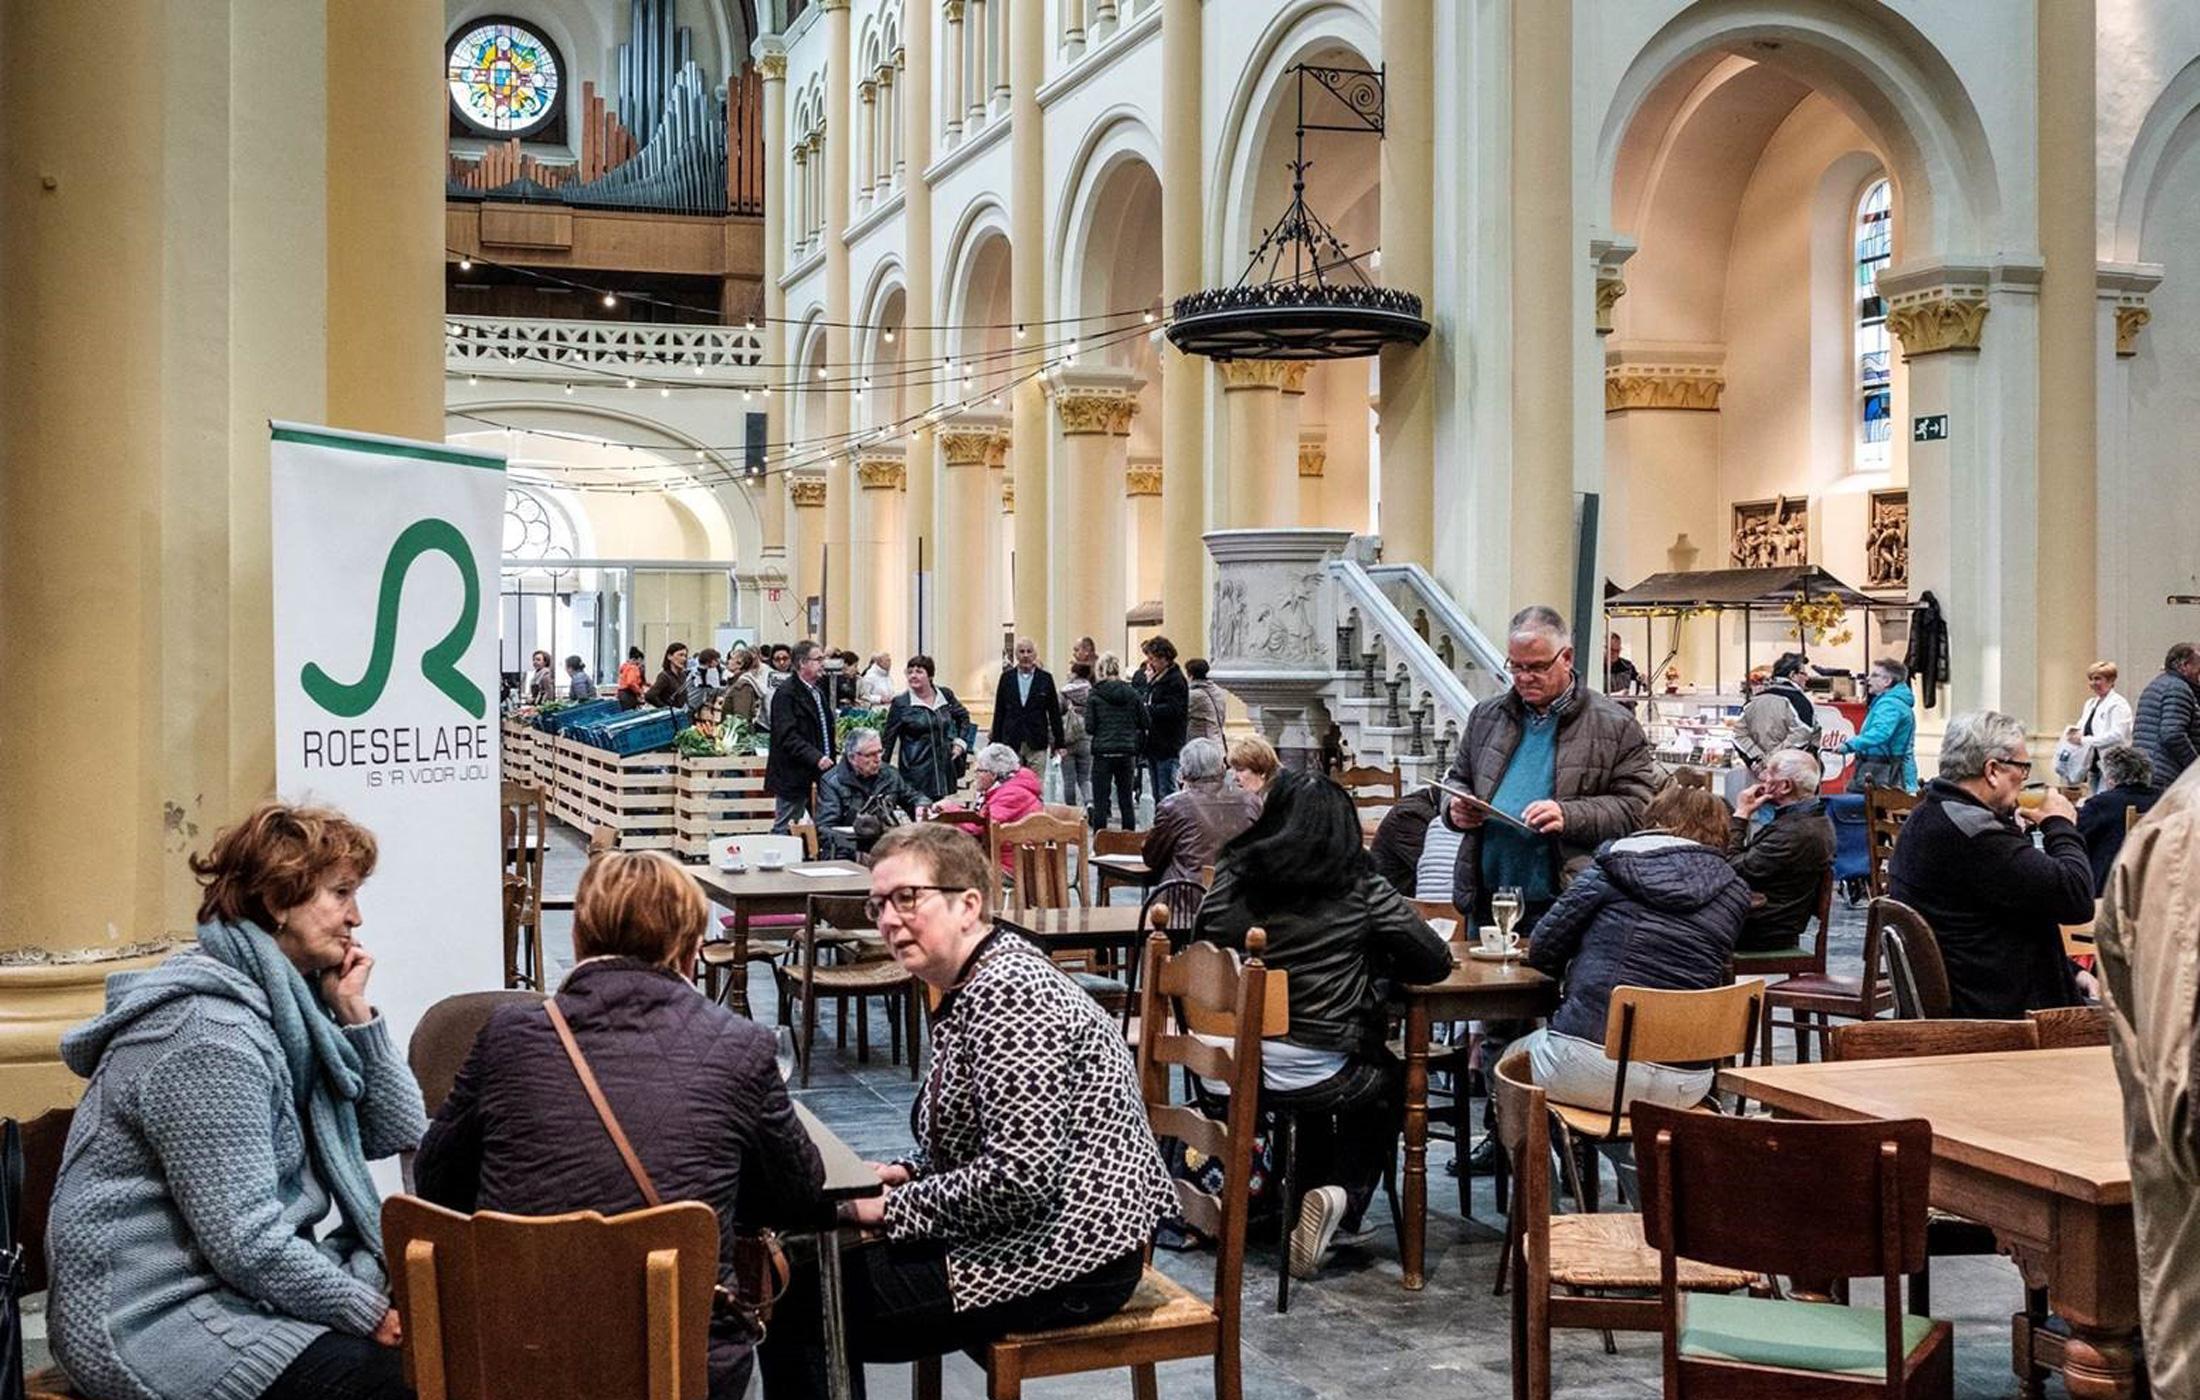 Streekproductenmarkt-in-Sint-Amandskerk-Roeselare